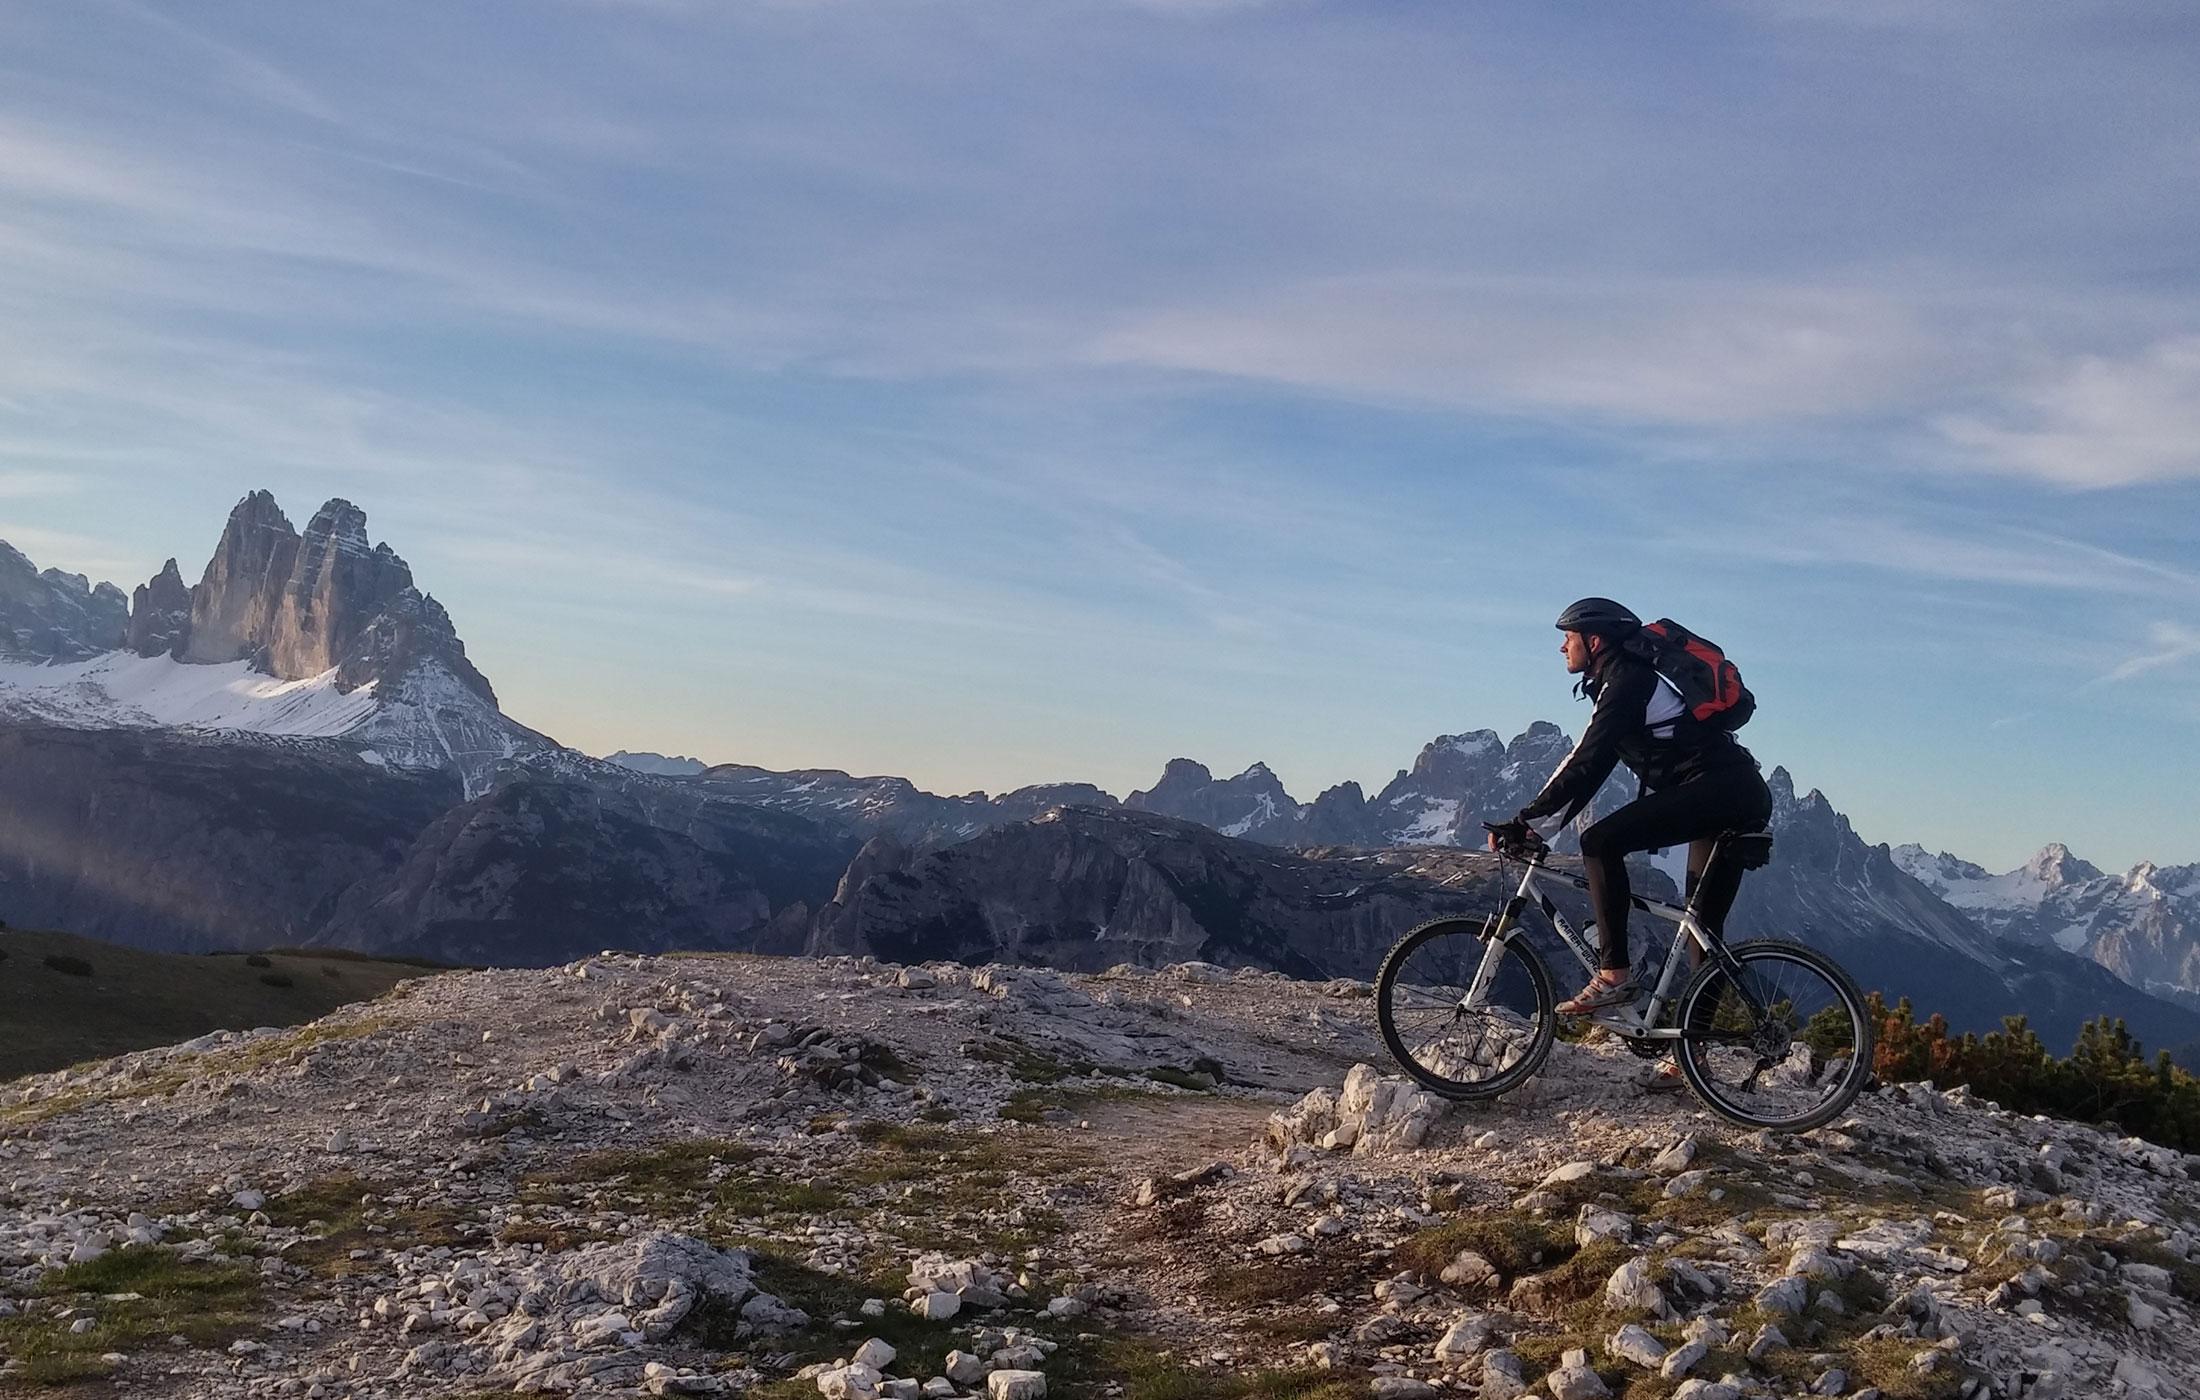 Christlrumerhof Slider Bike Angebote